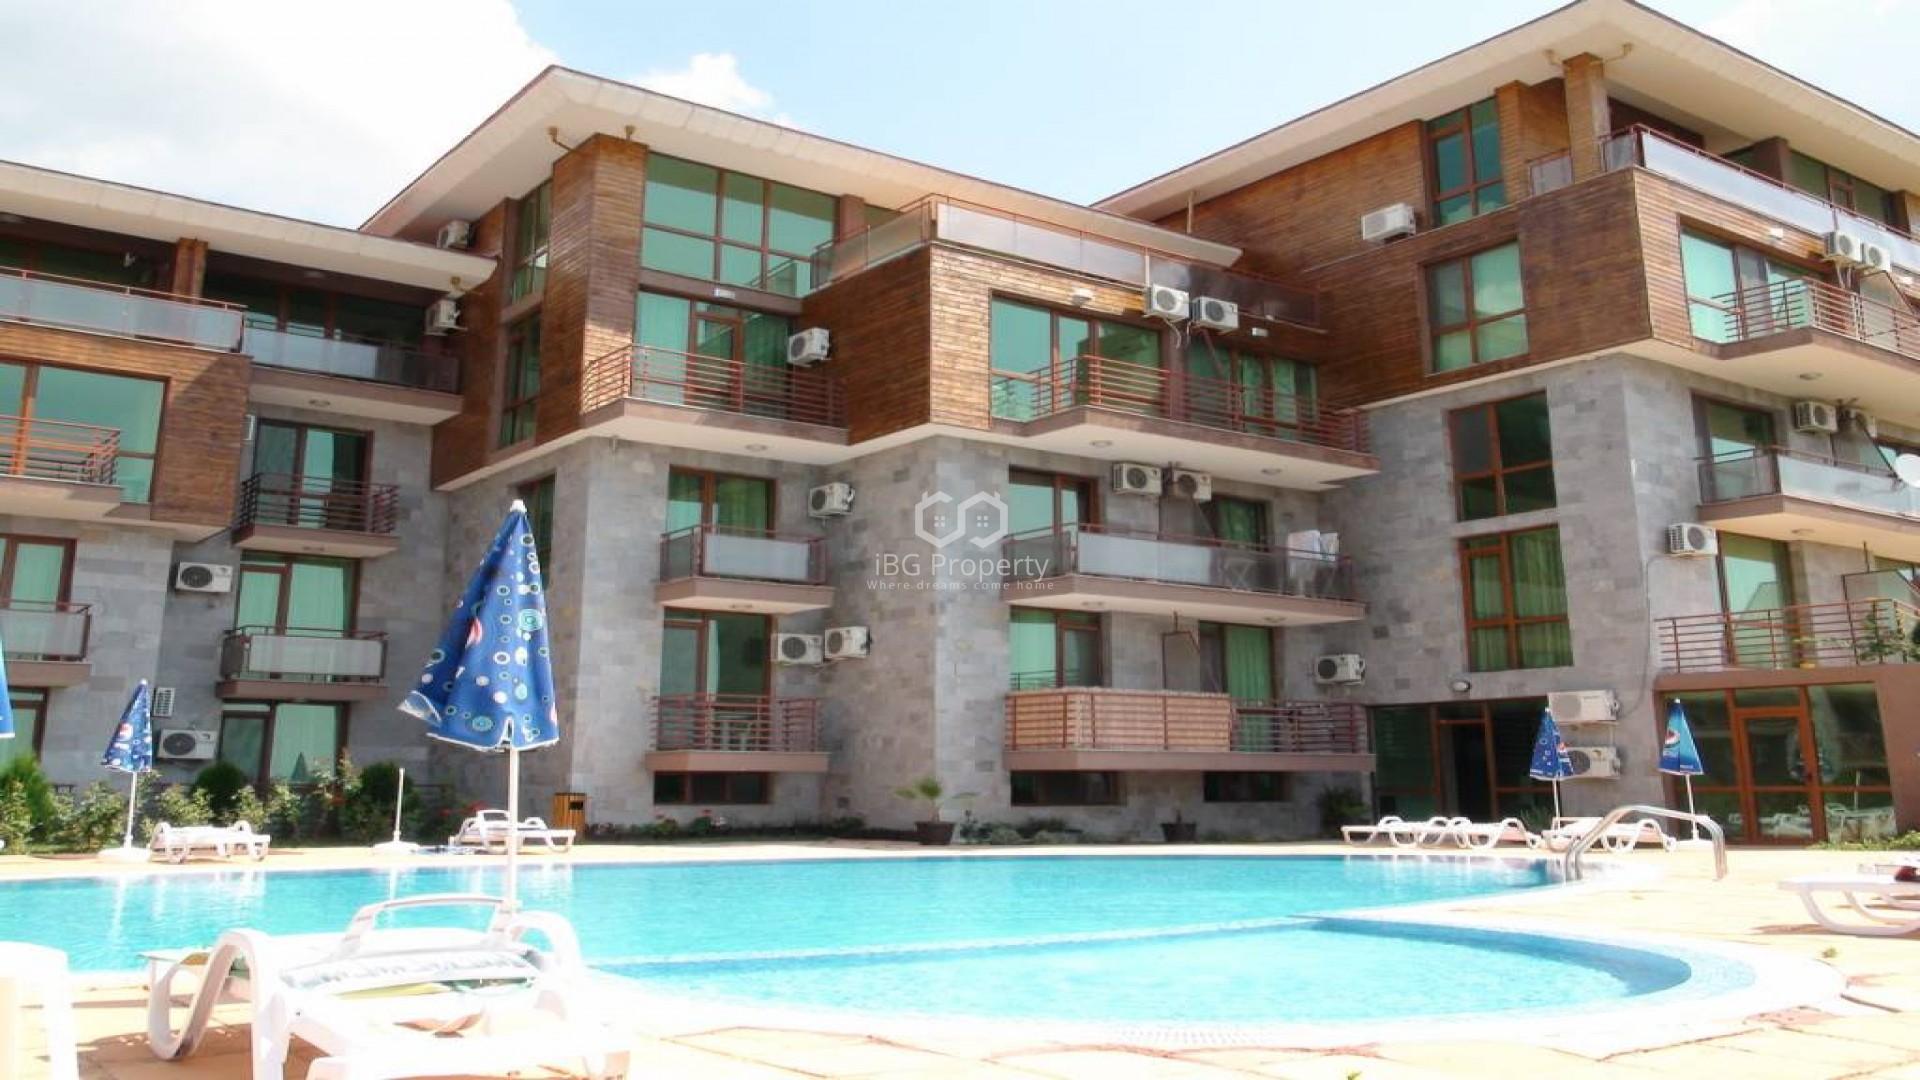 Двухкомнатная квартира Солнечный берег 70 m2